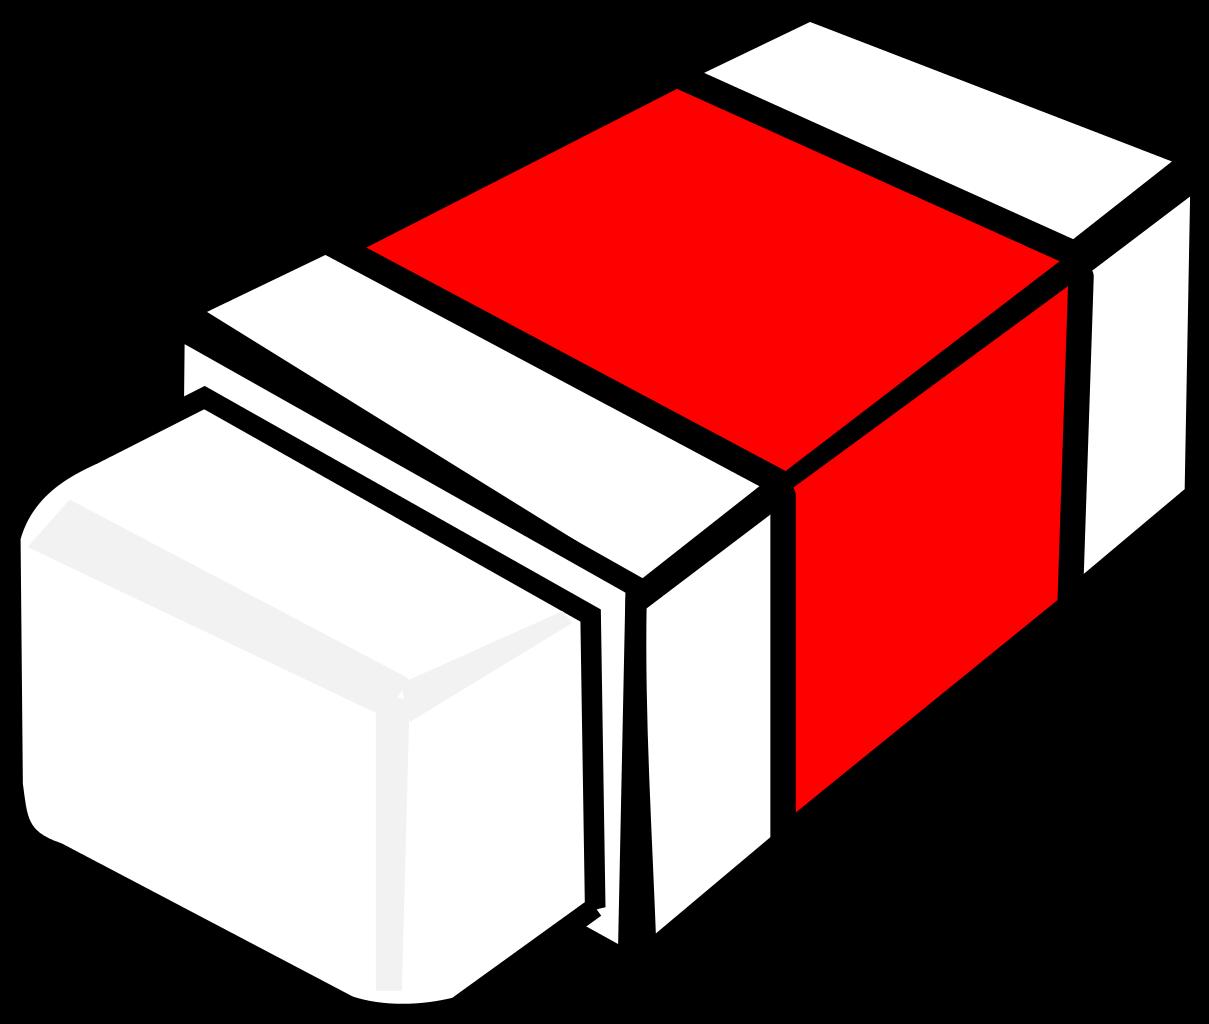 Eraser clipart dimension. File svg wikipedia fileerasersvg